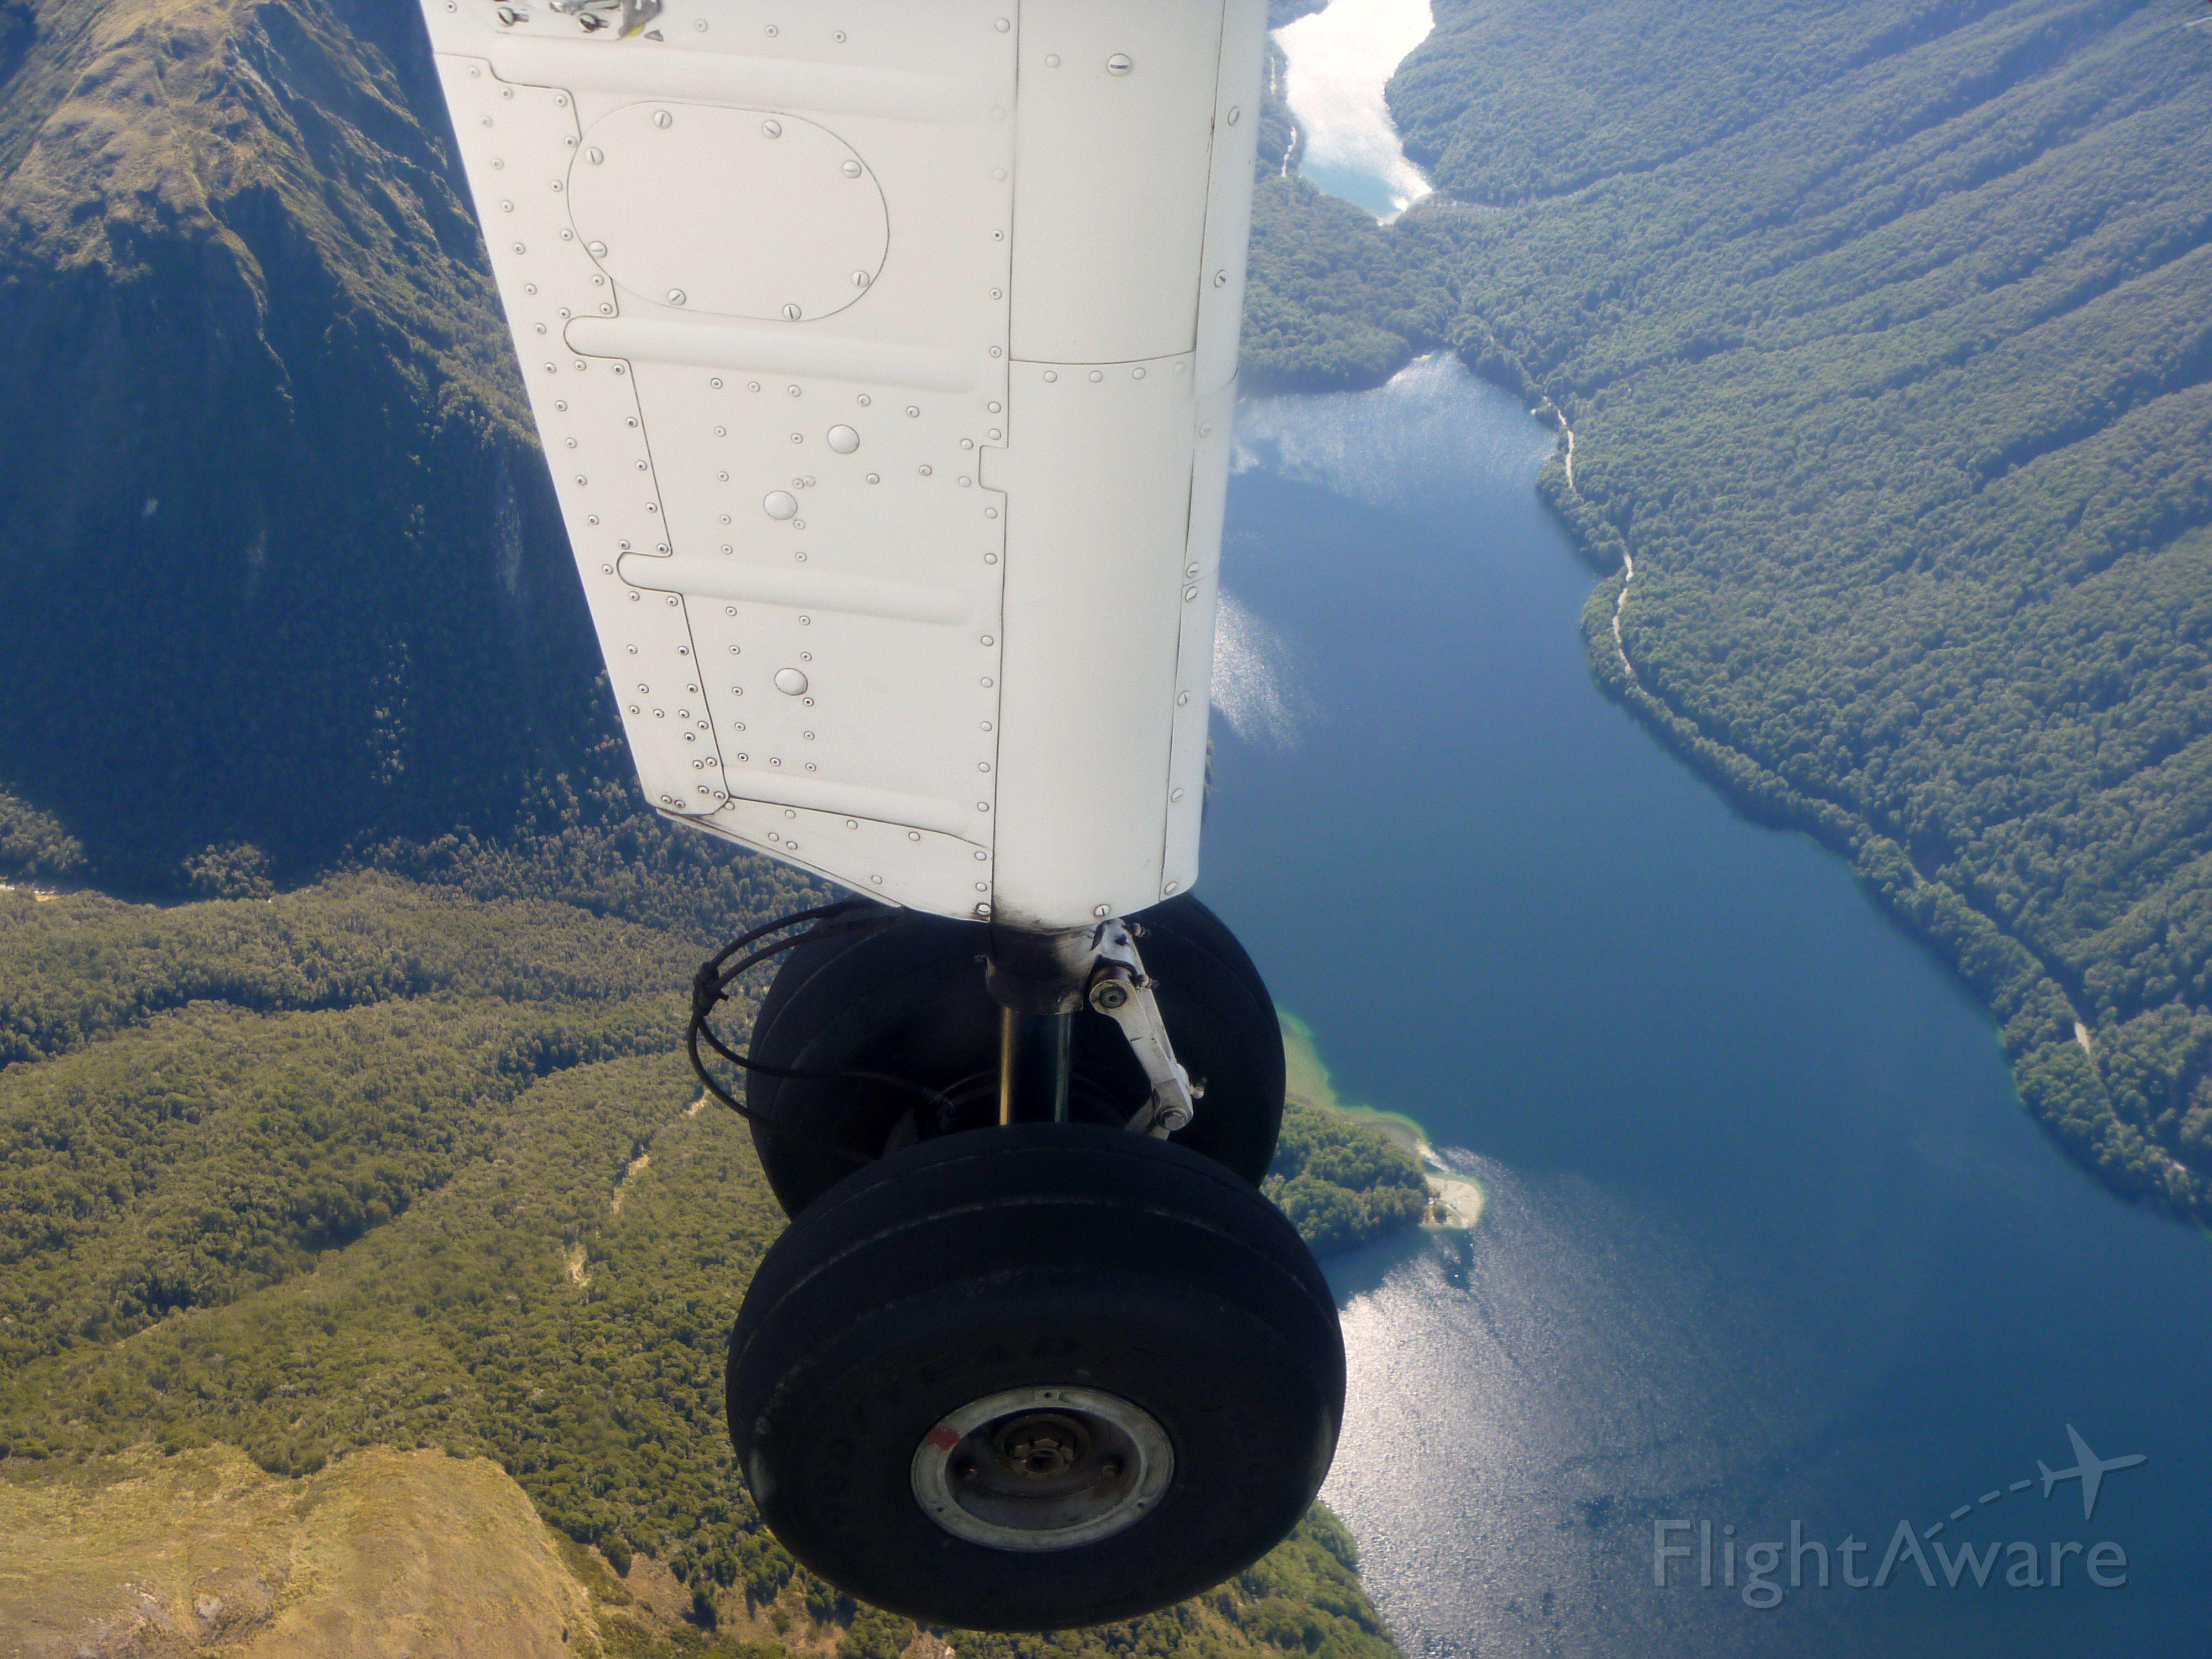 ROMAERO Islander — - Airline: Milford Sound Scenic Flights (unknown/unknown); Camera: Panasonic Lumix DMC-FP1; Date: 2 April 2012